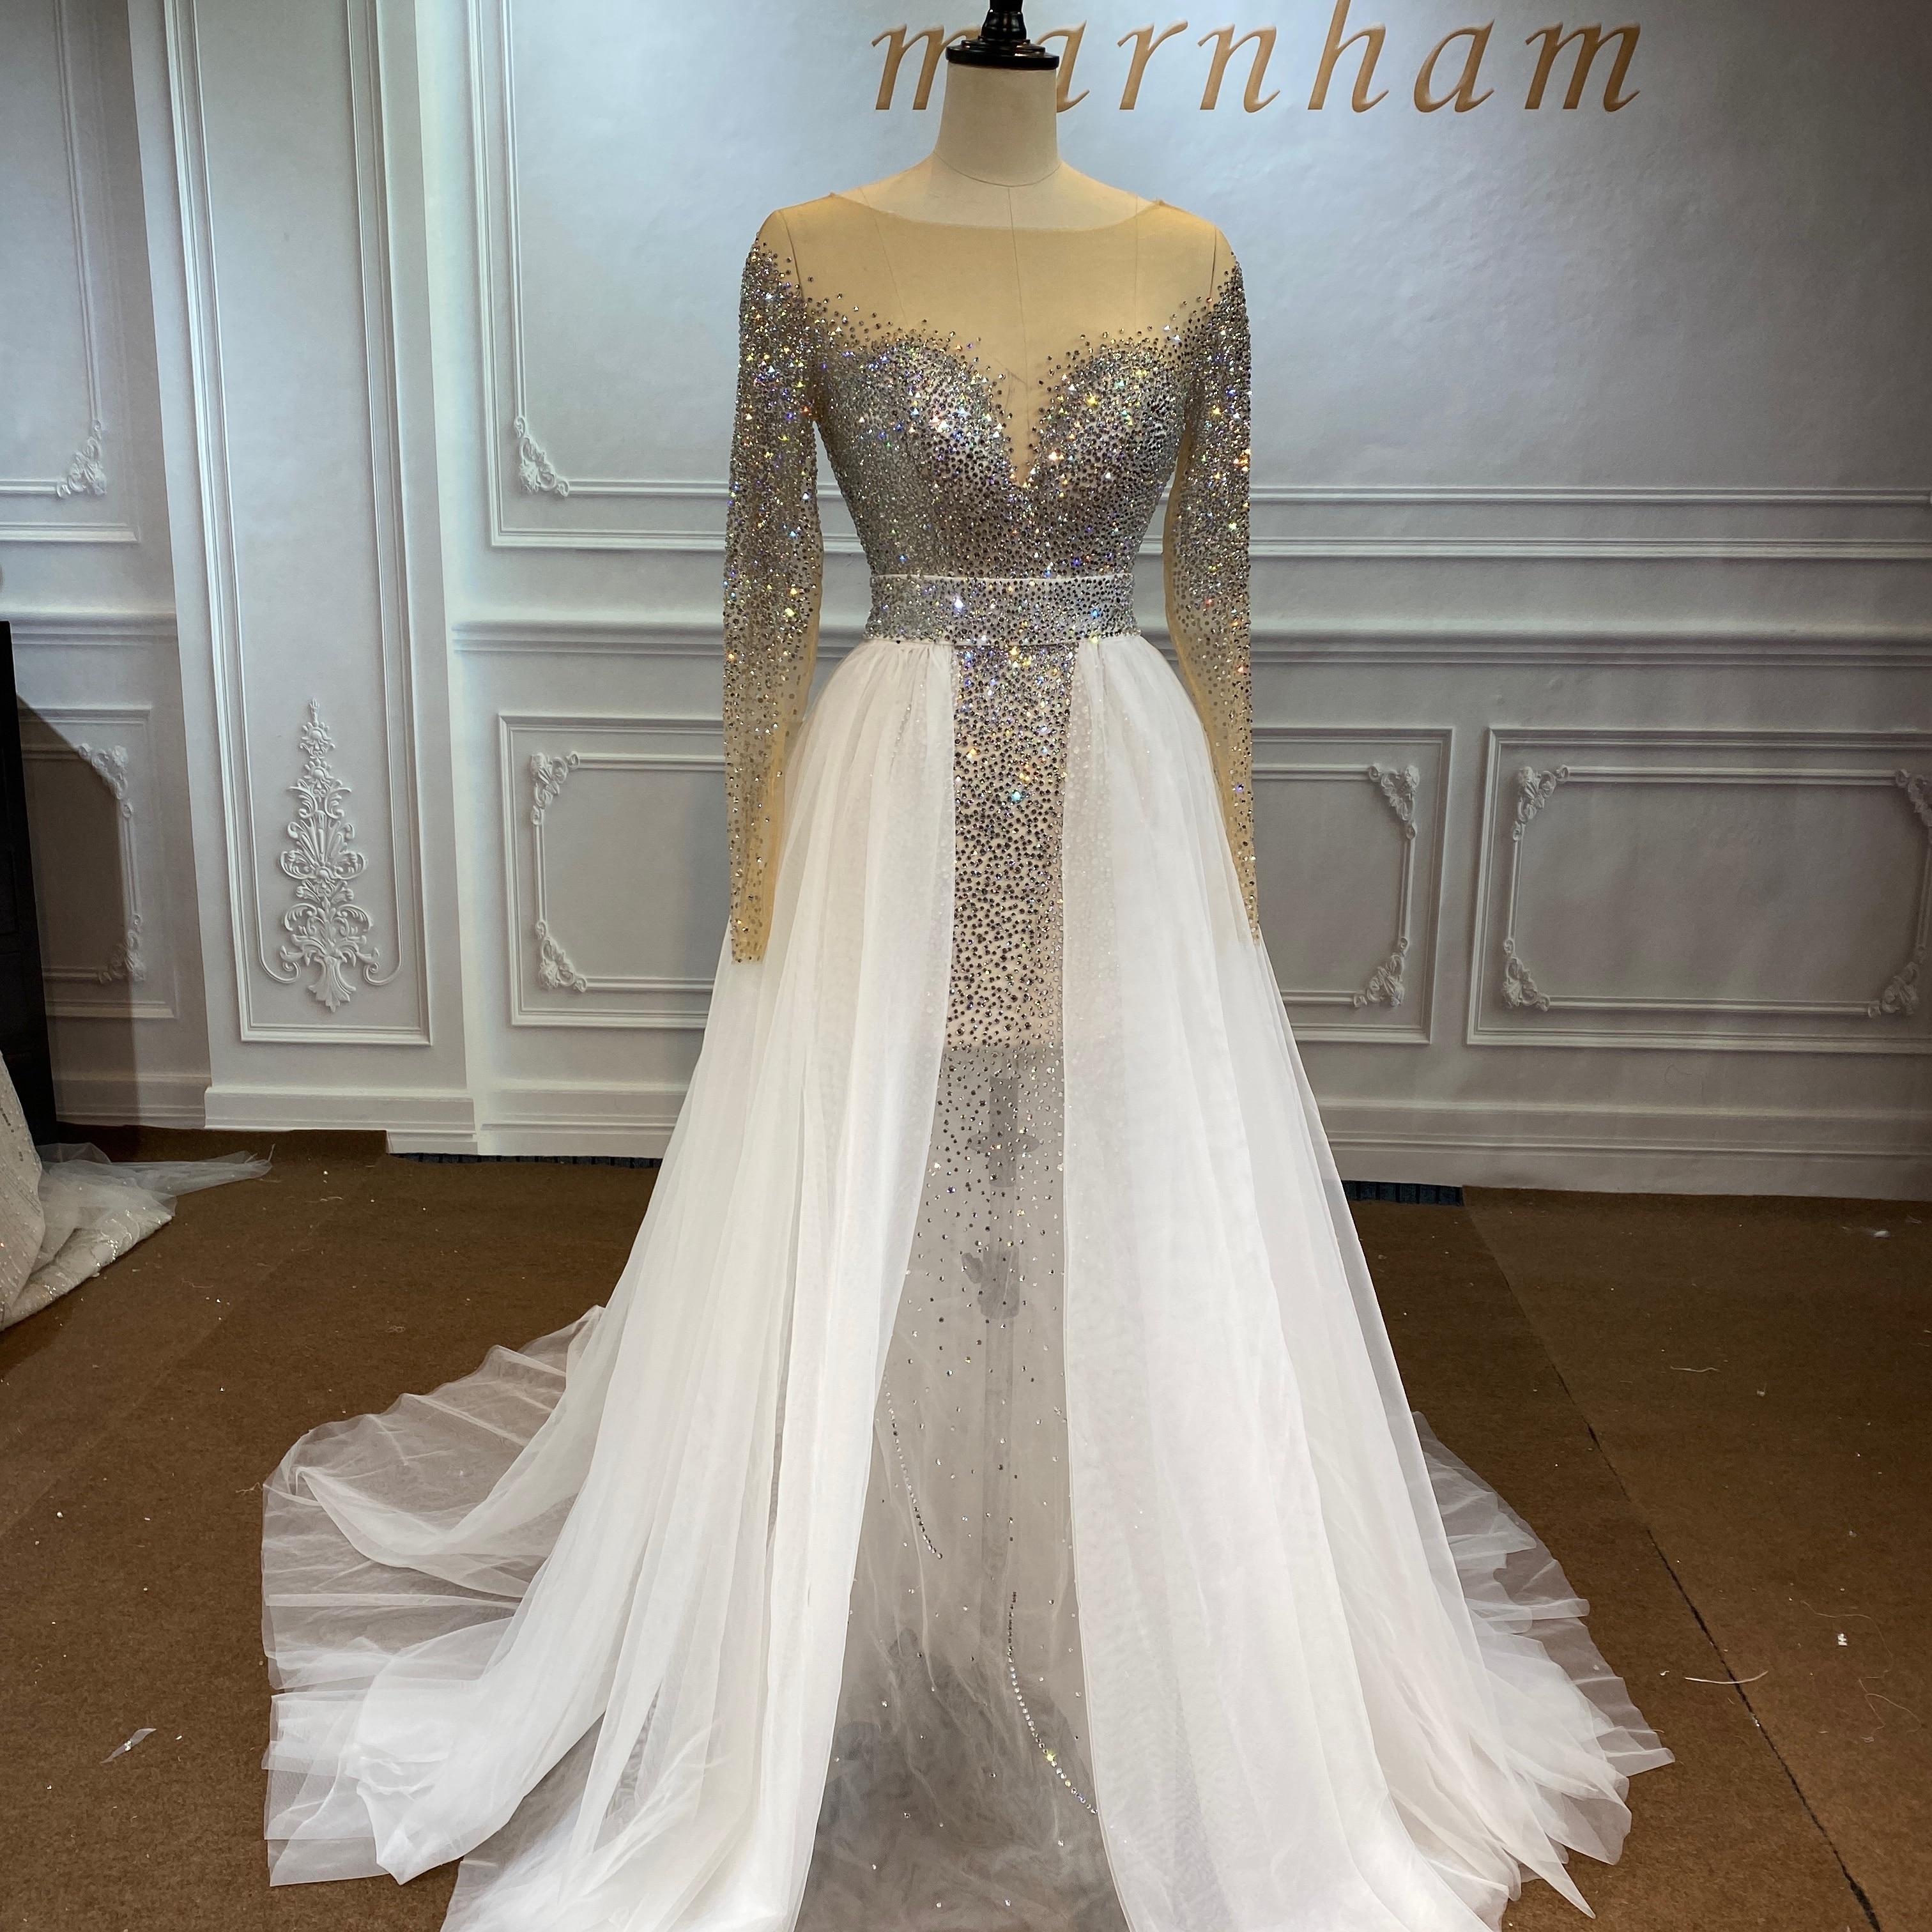 Marnham 2021 New Sexy  Mermaid Wedding Gown Bridal Dress Stunning V-Neck Lace Full Sleeve Real Work Photo